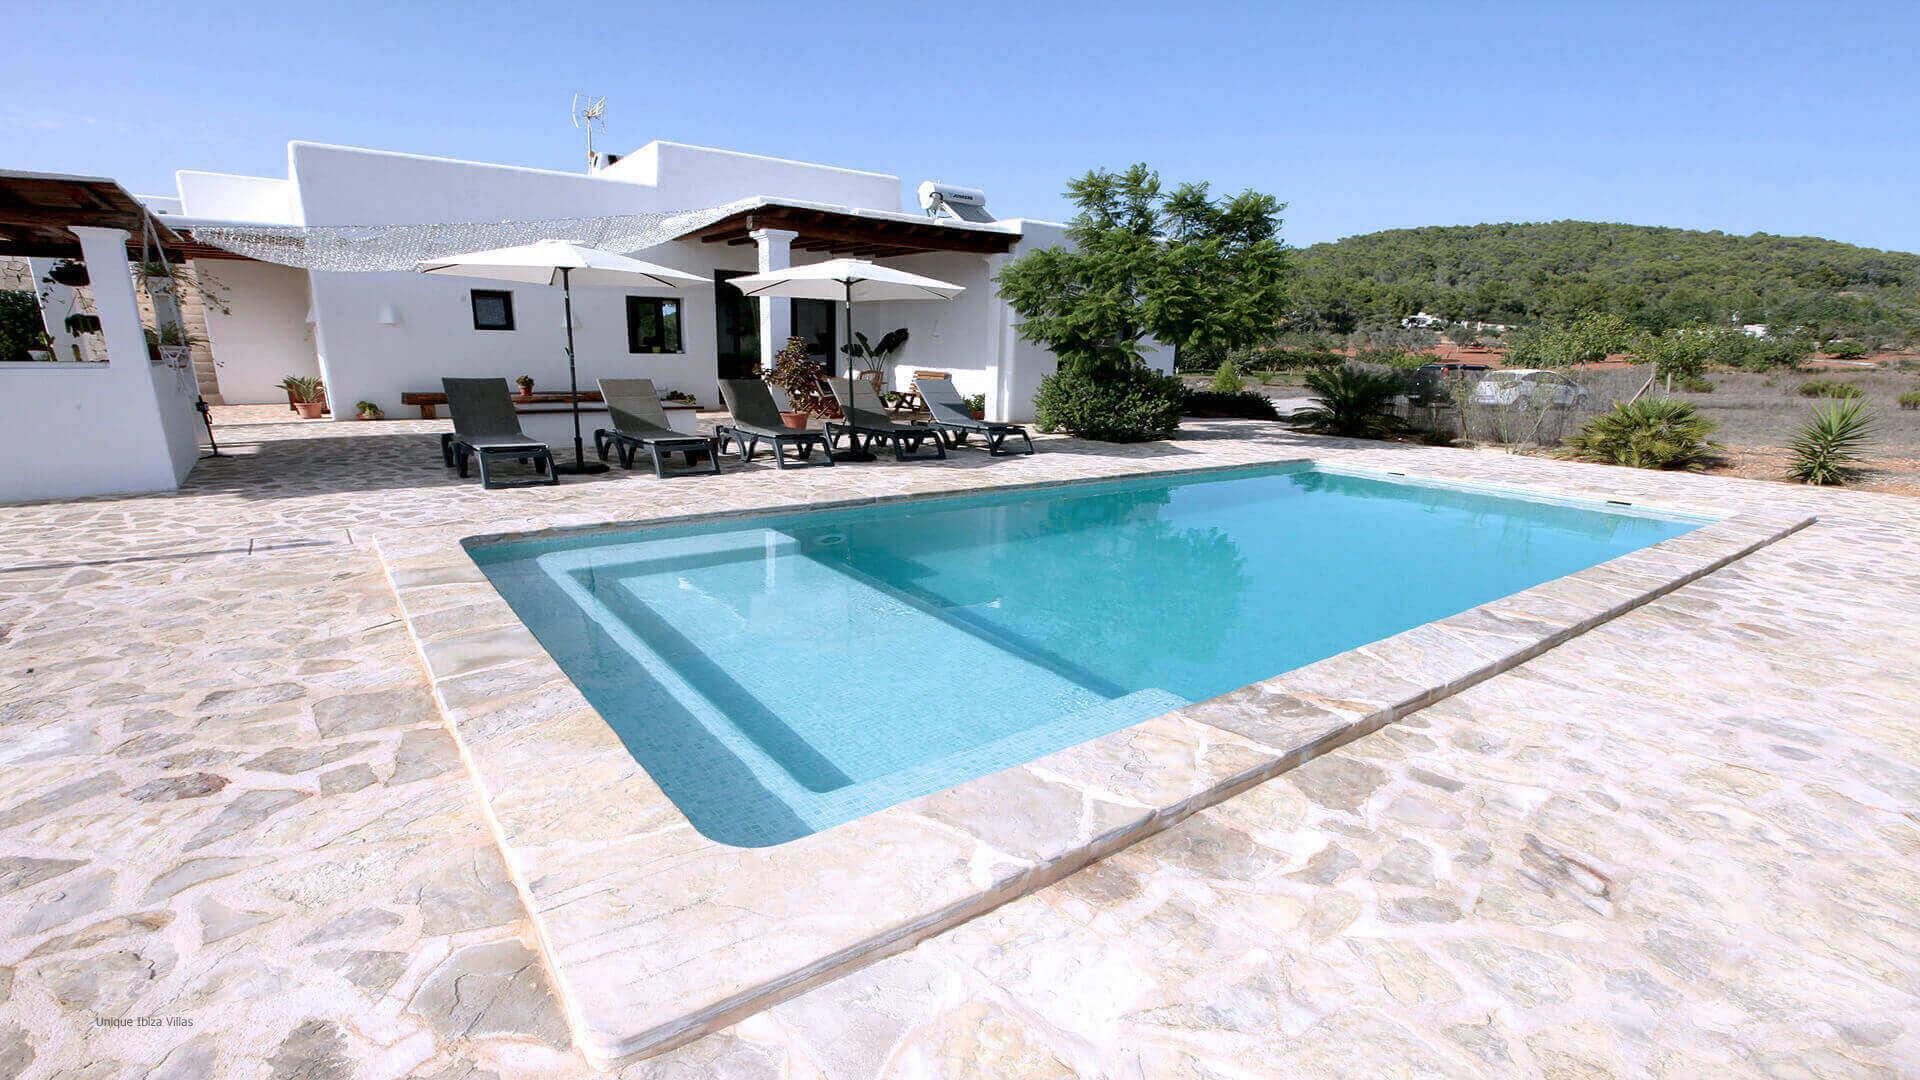 Cana Marieta Ibiza Villa 1 Near San Miguel